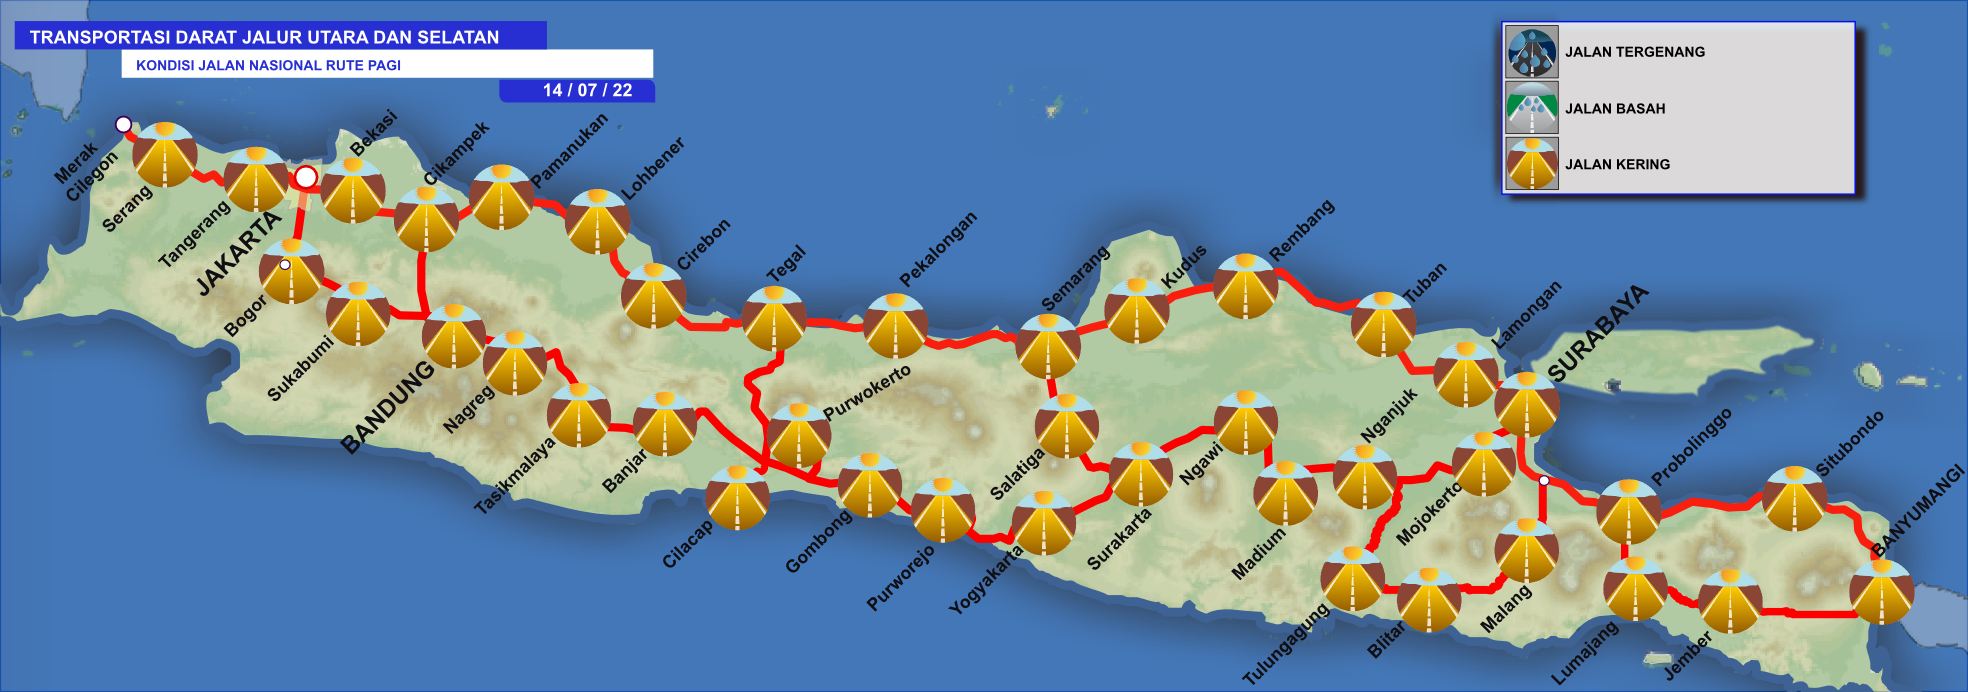 Prakiraan Kondisi Jalan (Tergenang/Basah/Kering) Transportasi Darat Jalur Utara dan Selatan Hari Ini Pada Pagi Hari